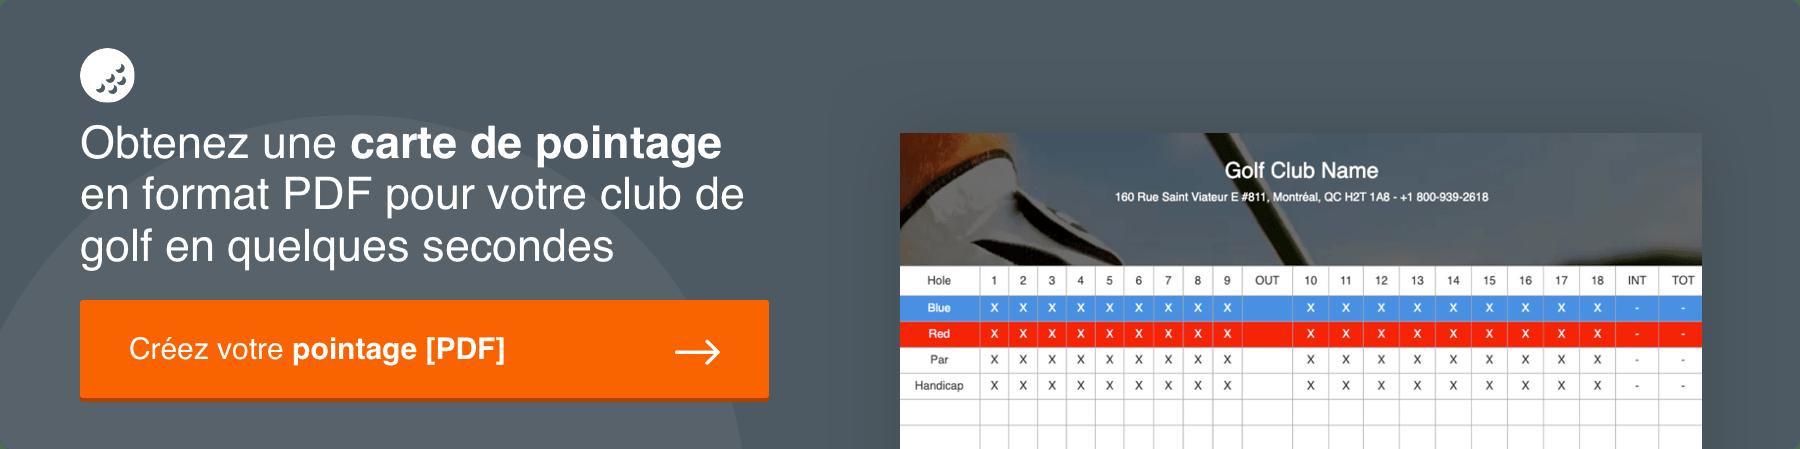 golf-carte-pointage-blog-min